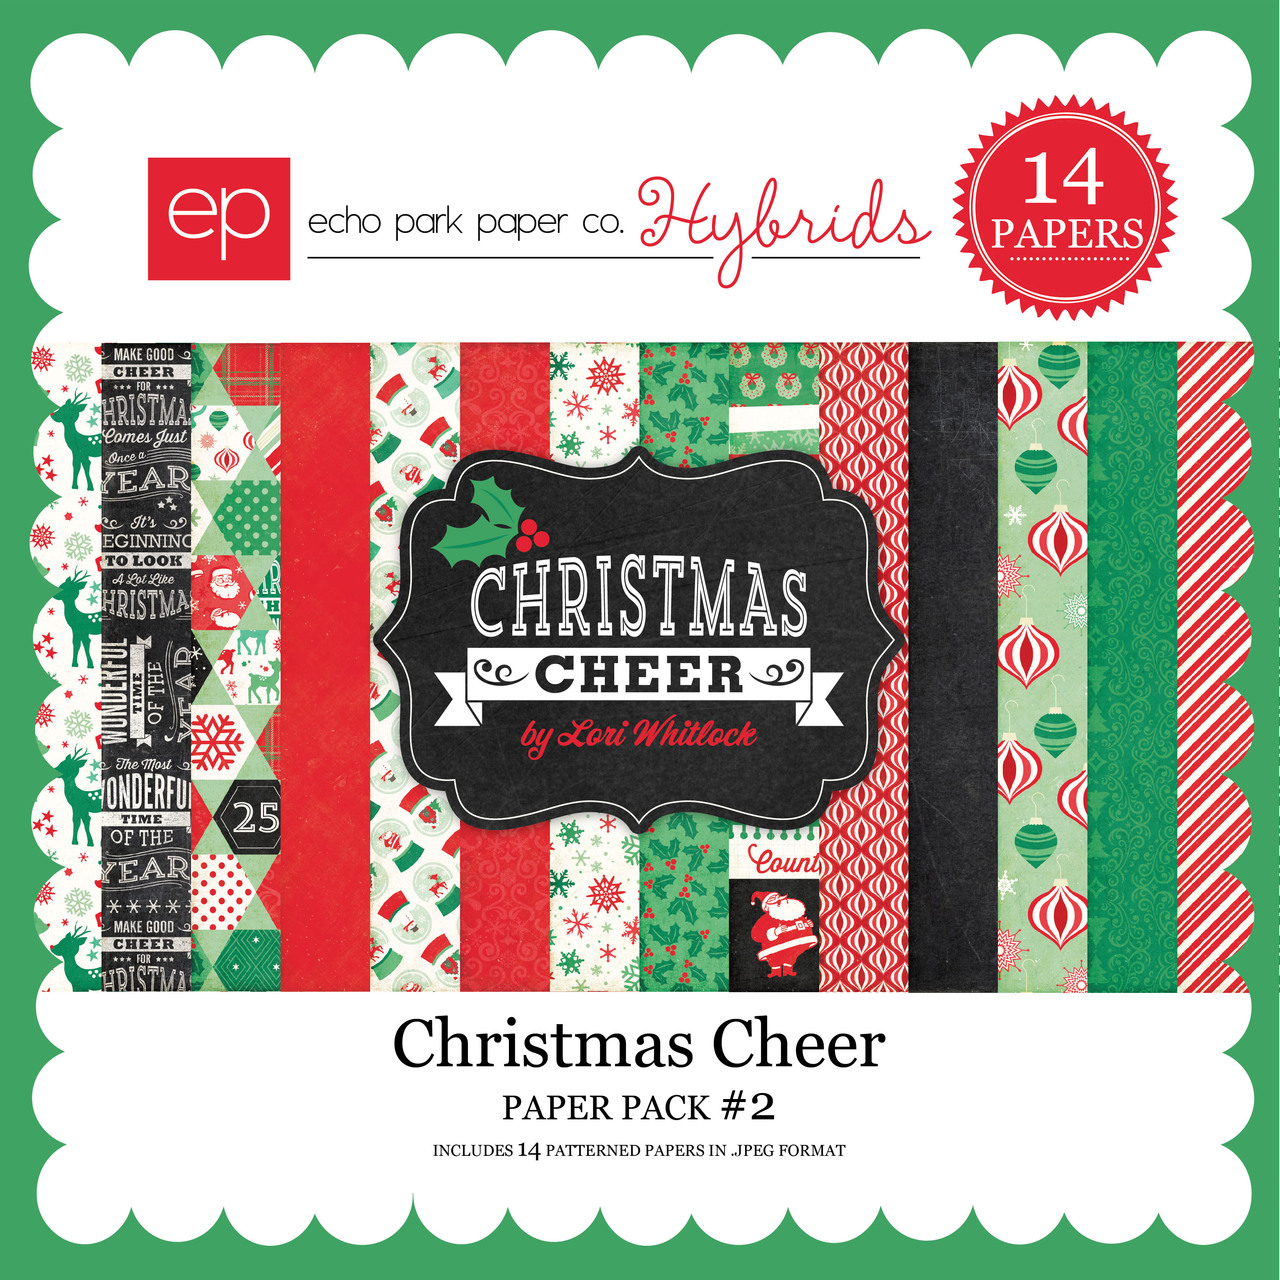 Christmas Cheer Paper Pack #2